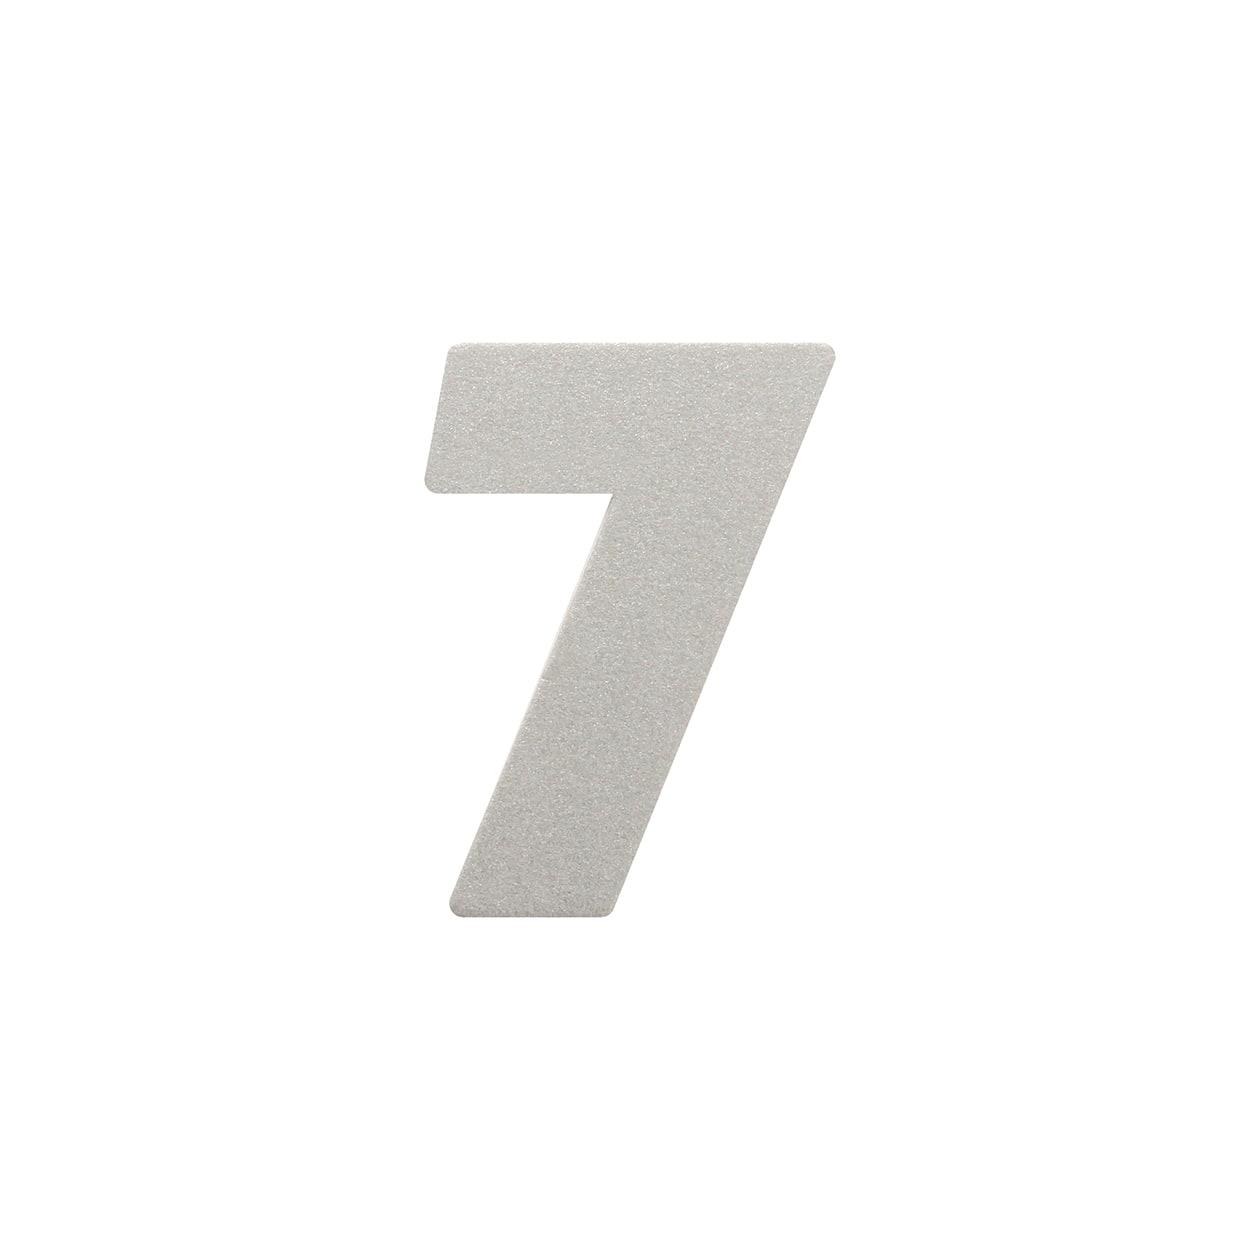 No.395ボード ネームカードDC 数字7 シルバー